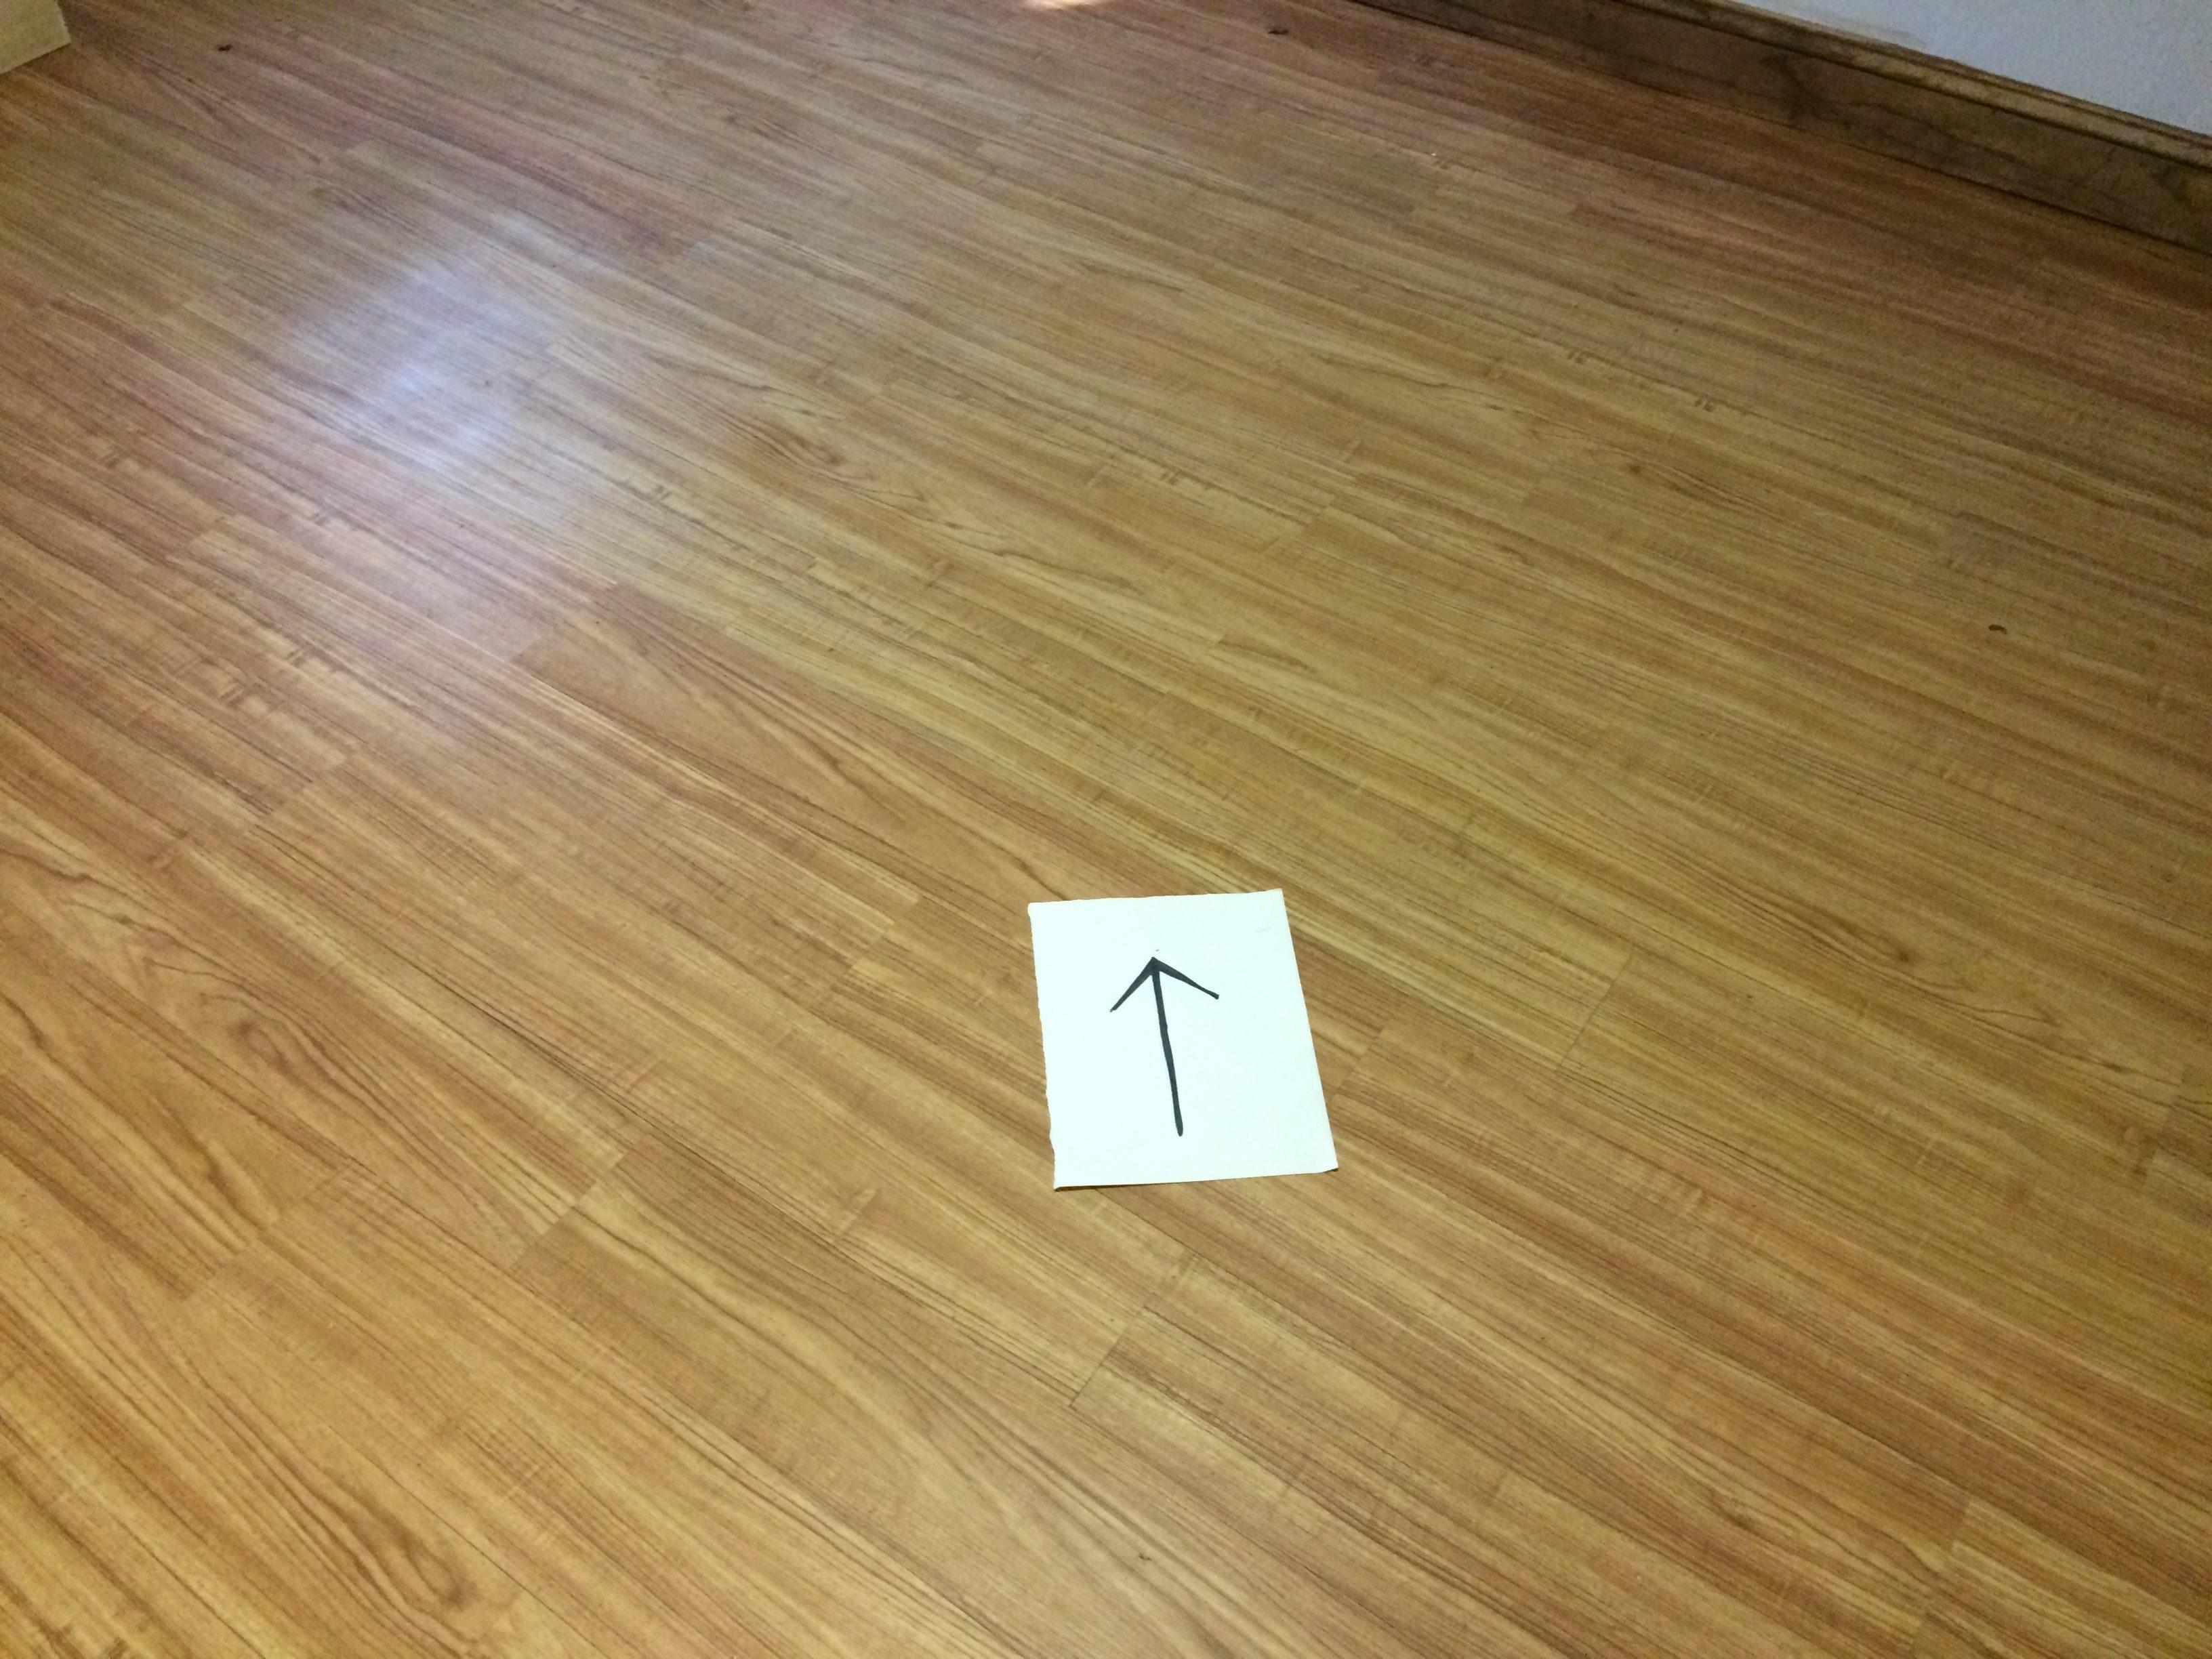 Images Of Home Depot Carpet Installation